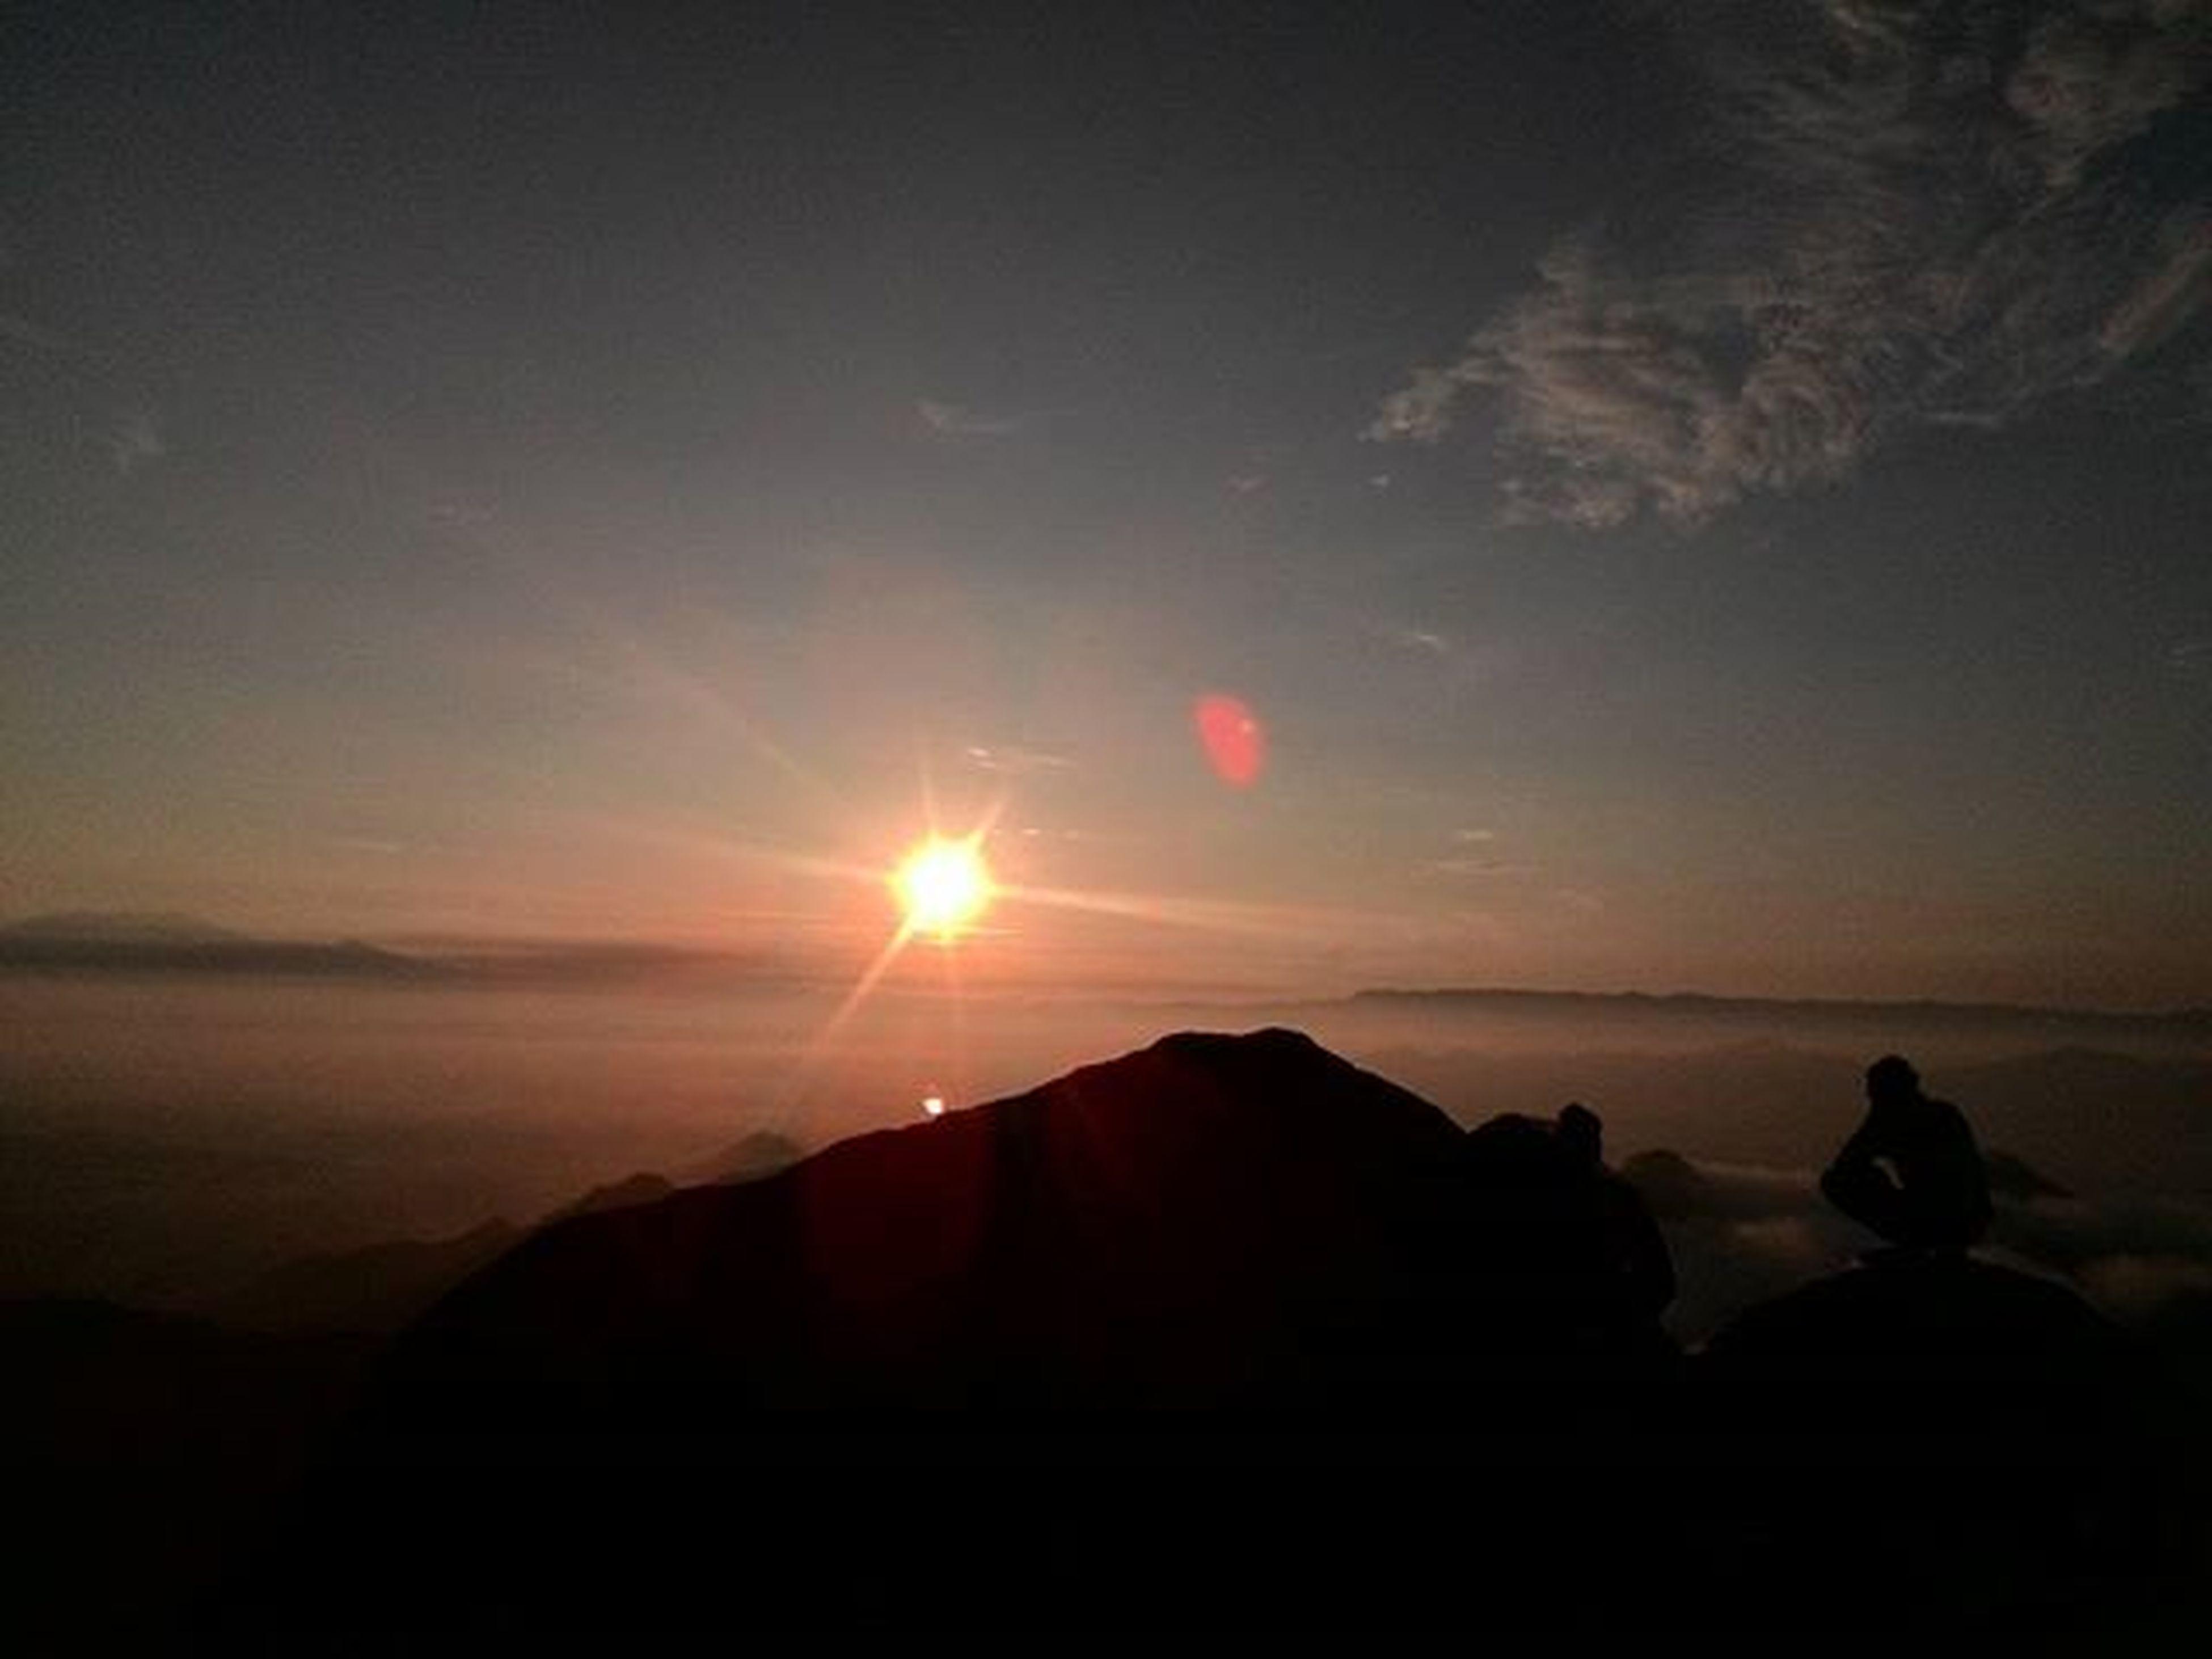 sun, scenics, tranquil scene, mountain, tranquility, sunset, beauty in nature, silhouette, sky, mountain range, nature, sunbeam, sunlight, landscape, idyllic, lens flare, non-urban scene, cloud - sky, remote, outdoors